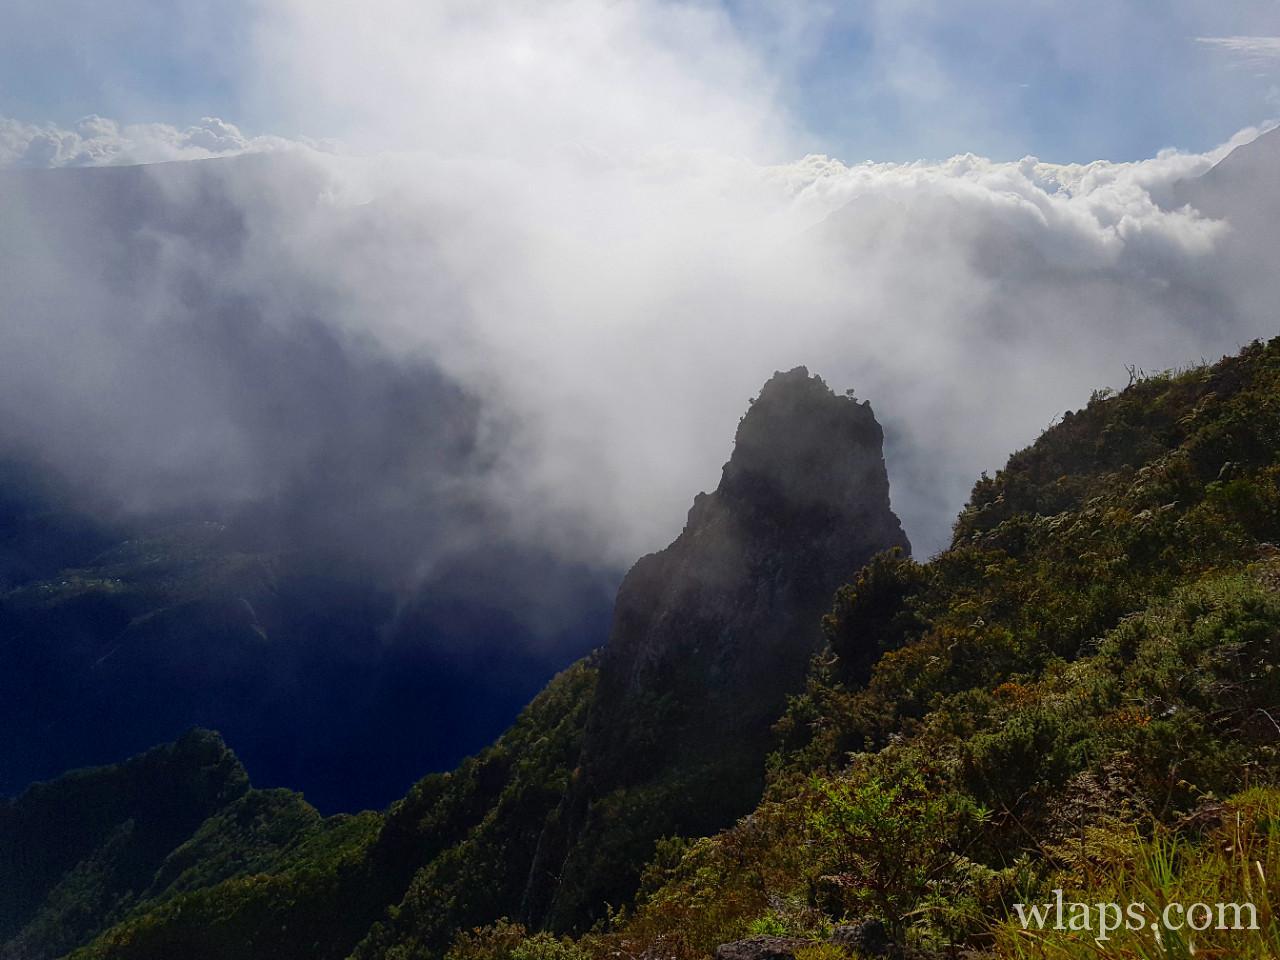 Mafate dans le brouillard à La Réunion